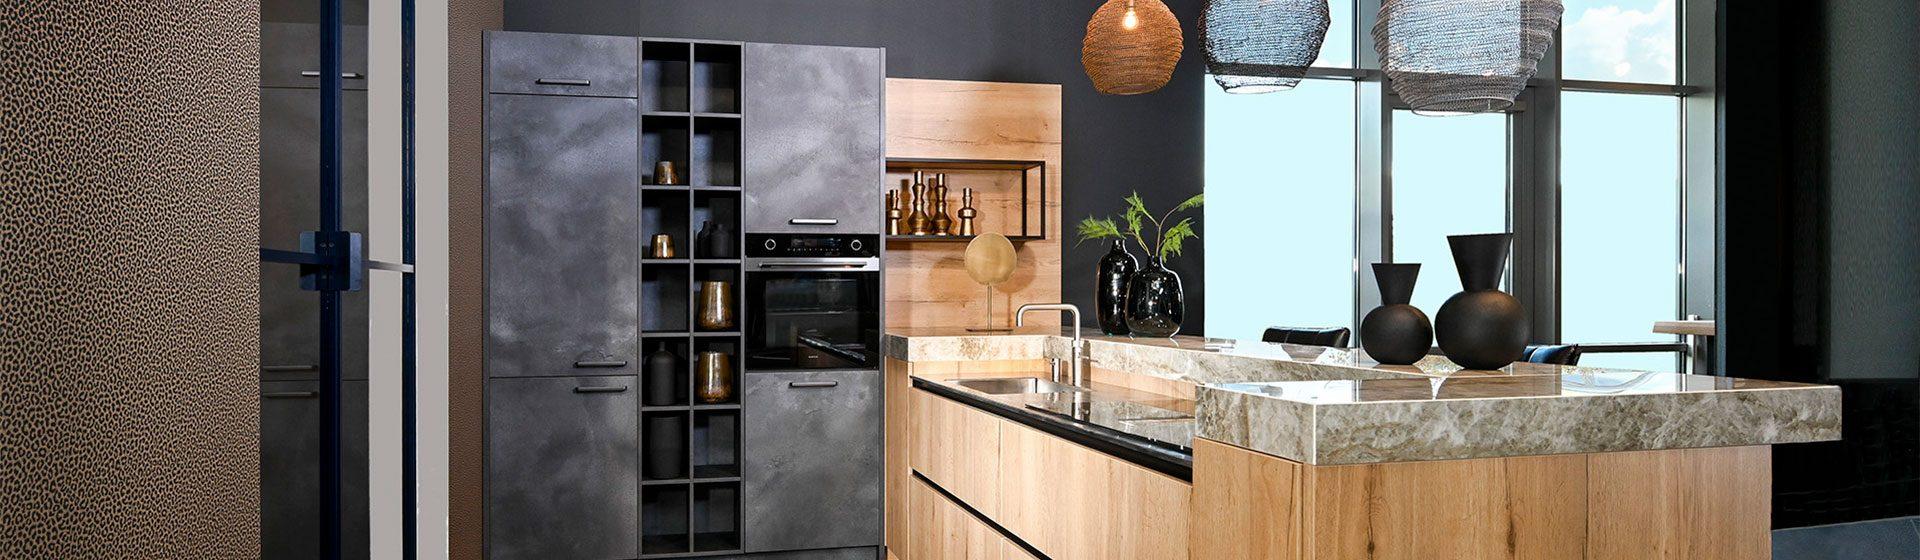 Hans van der Helm Keukens - Trendy Kwaliteitskeuken 15